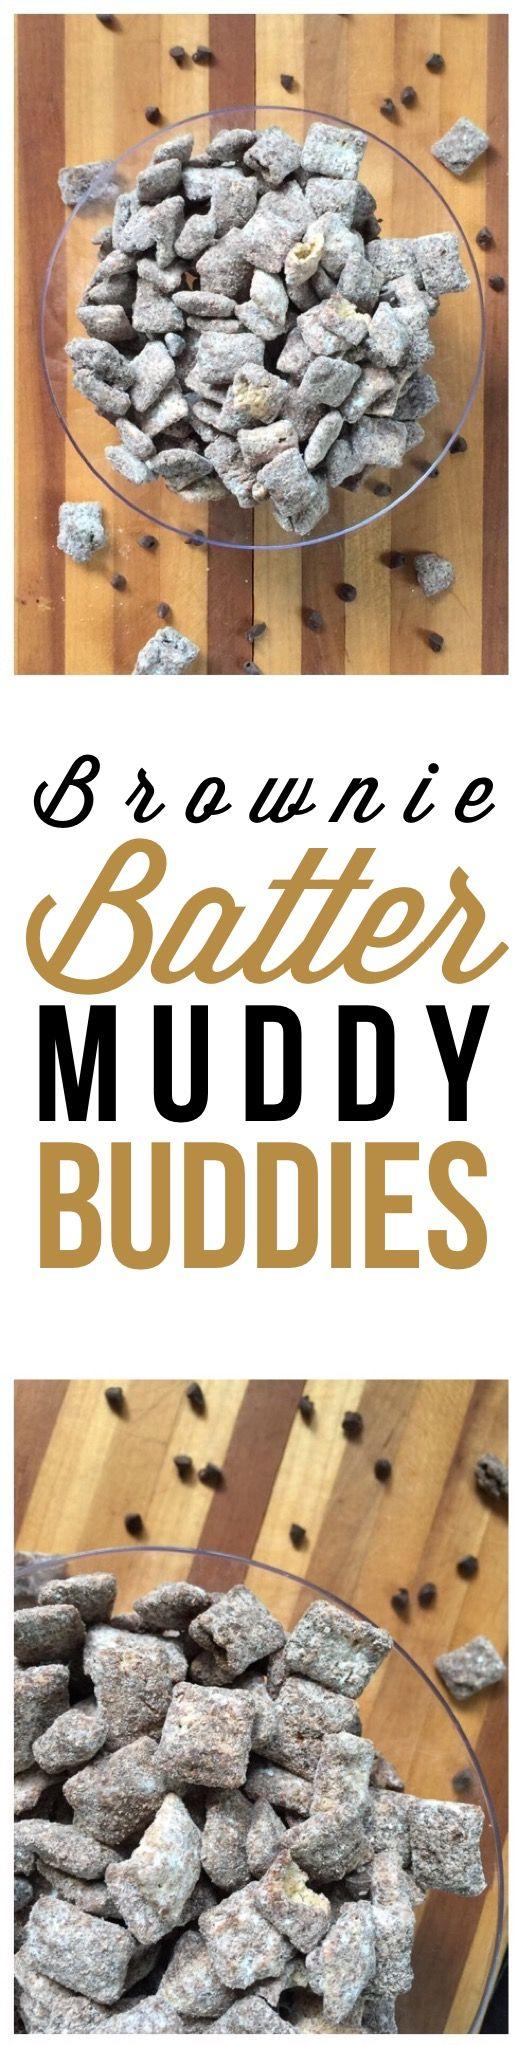 Brownie Batter Muddy Buddies Recipe